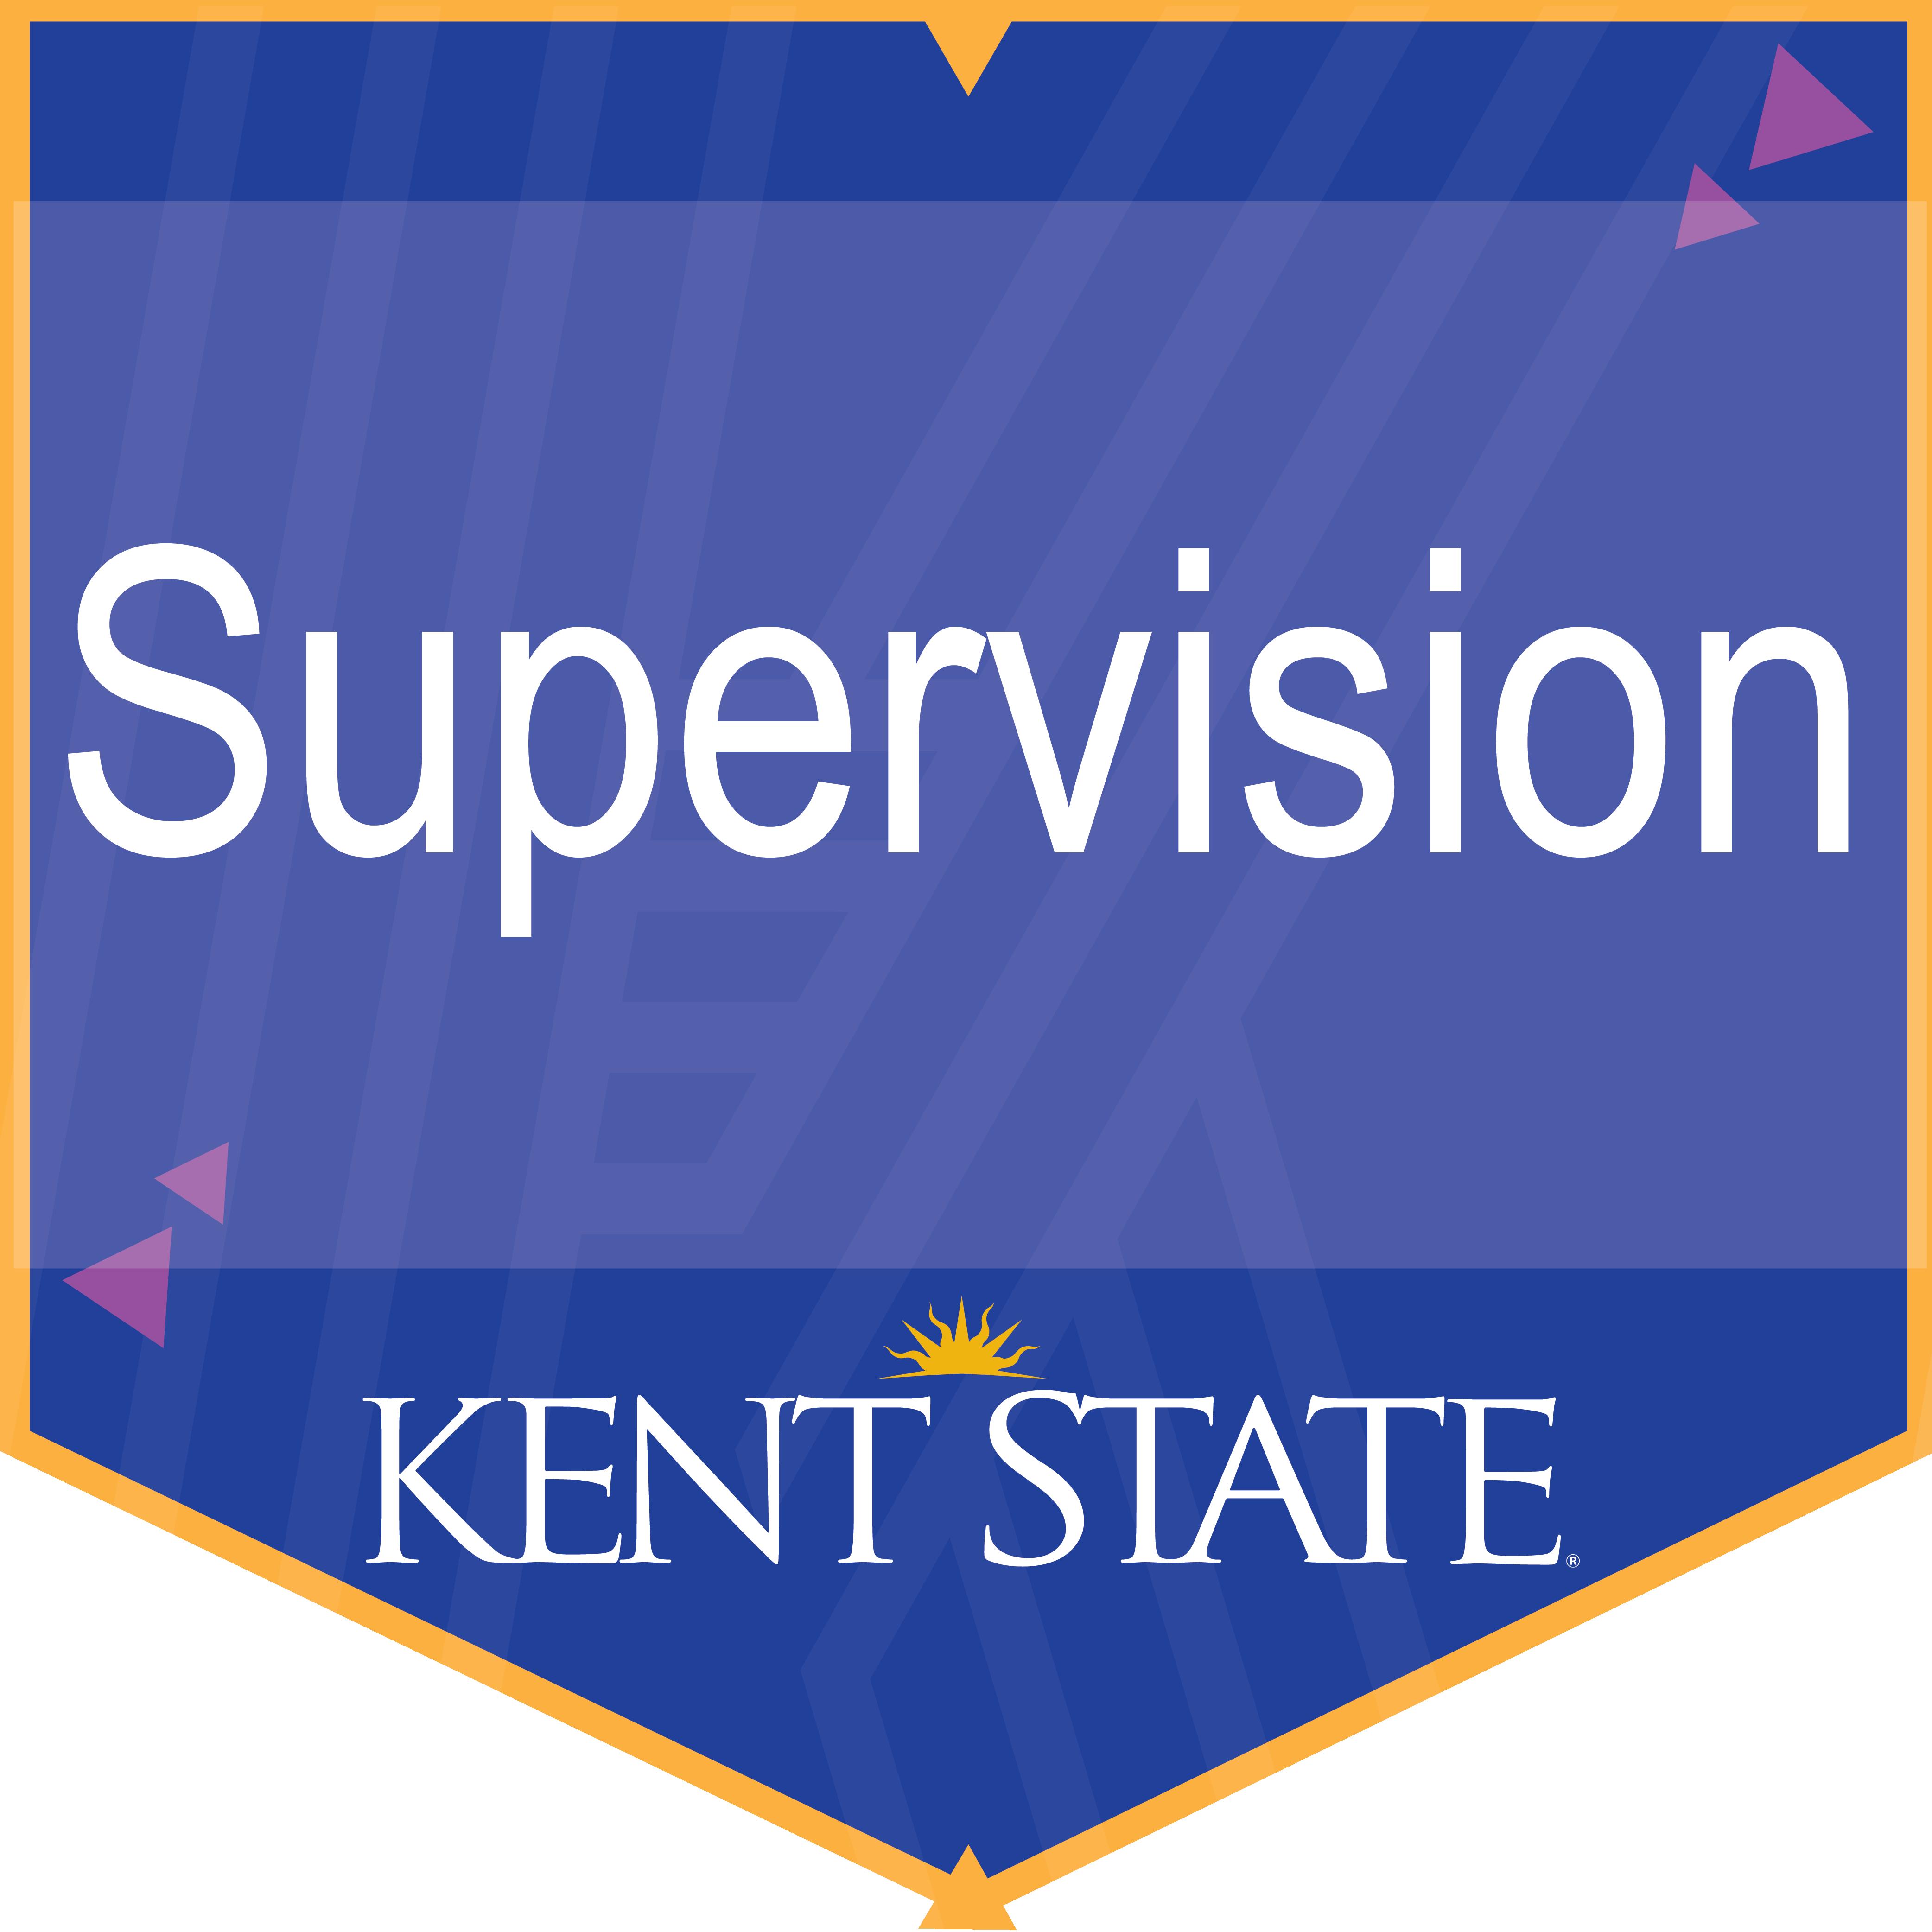 Certificate of Supervision Digital Badge